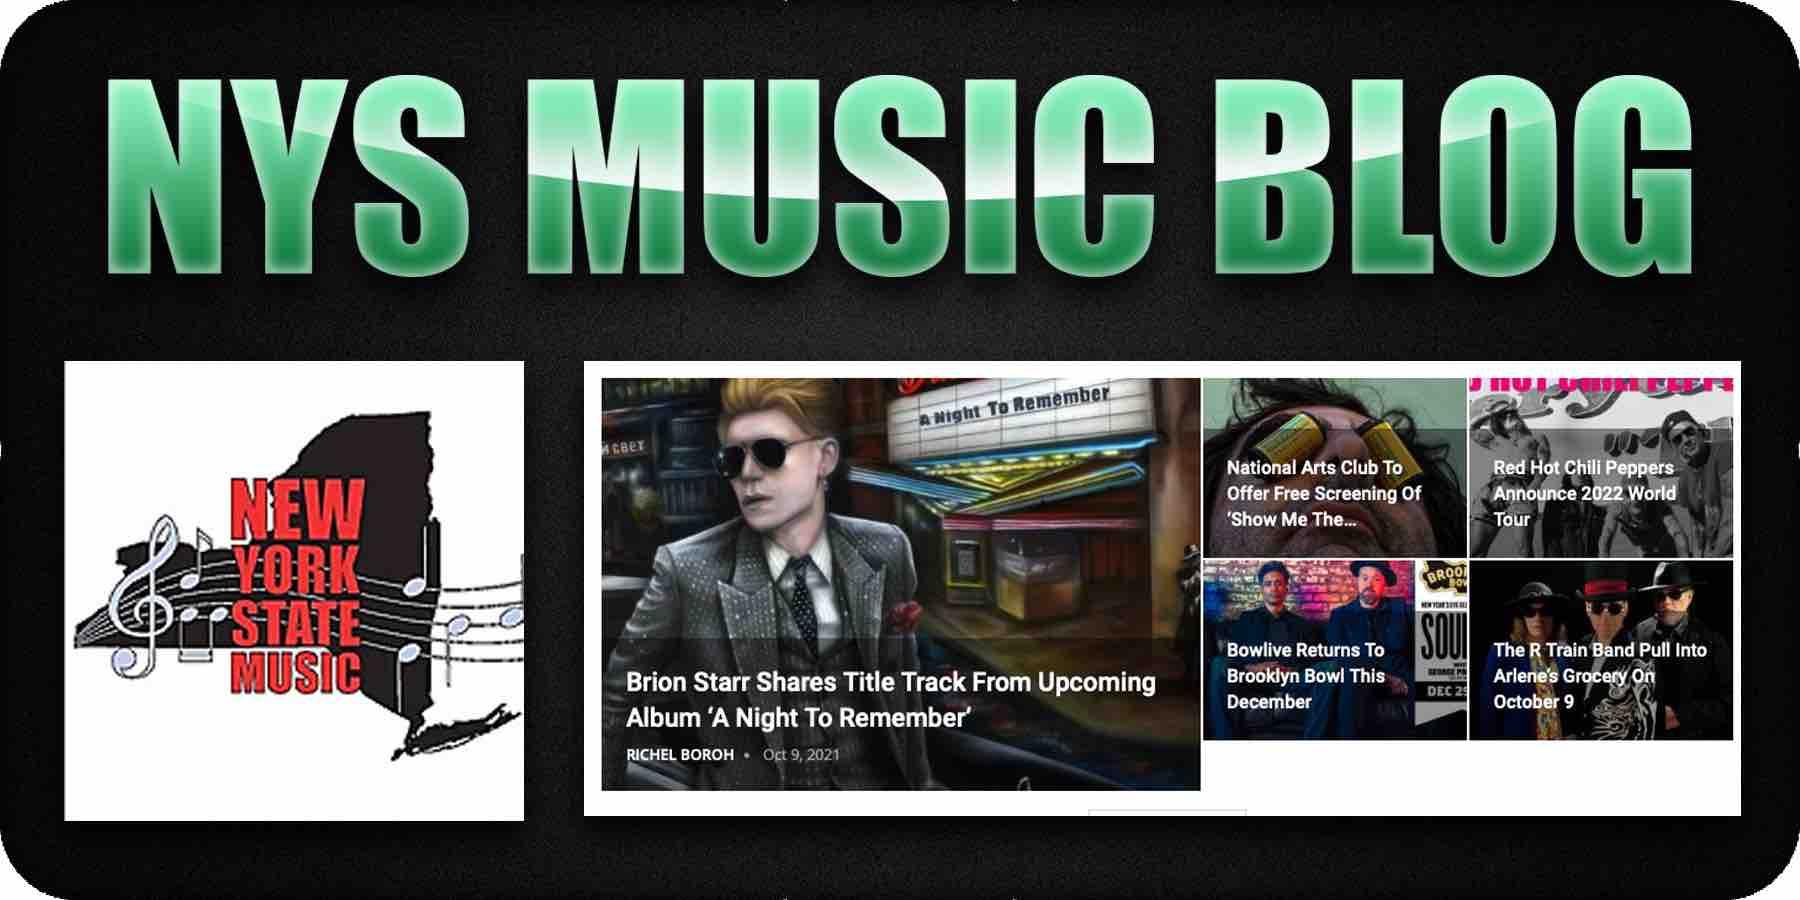 NYS music blog